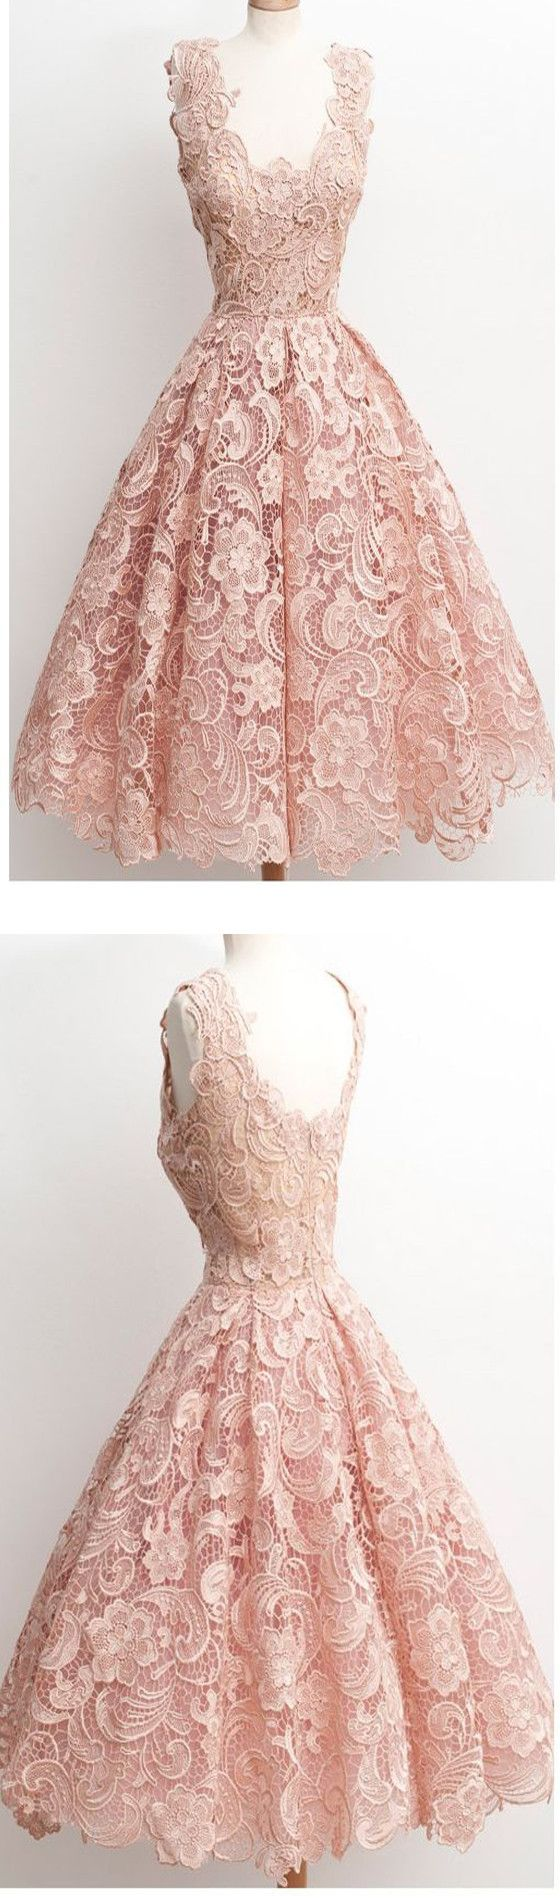 Dark Pink Lace Floral prints Vintage tea length elegant casual homecoming prom d…